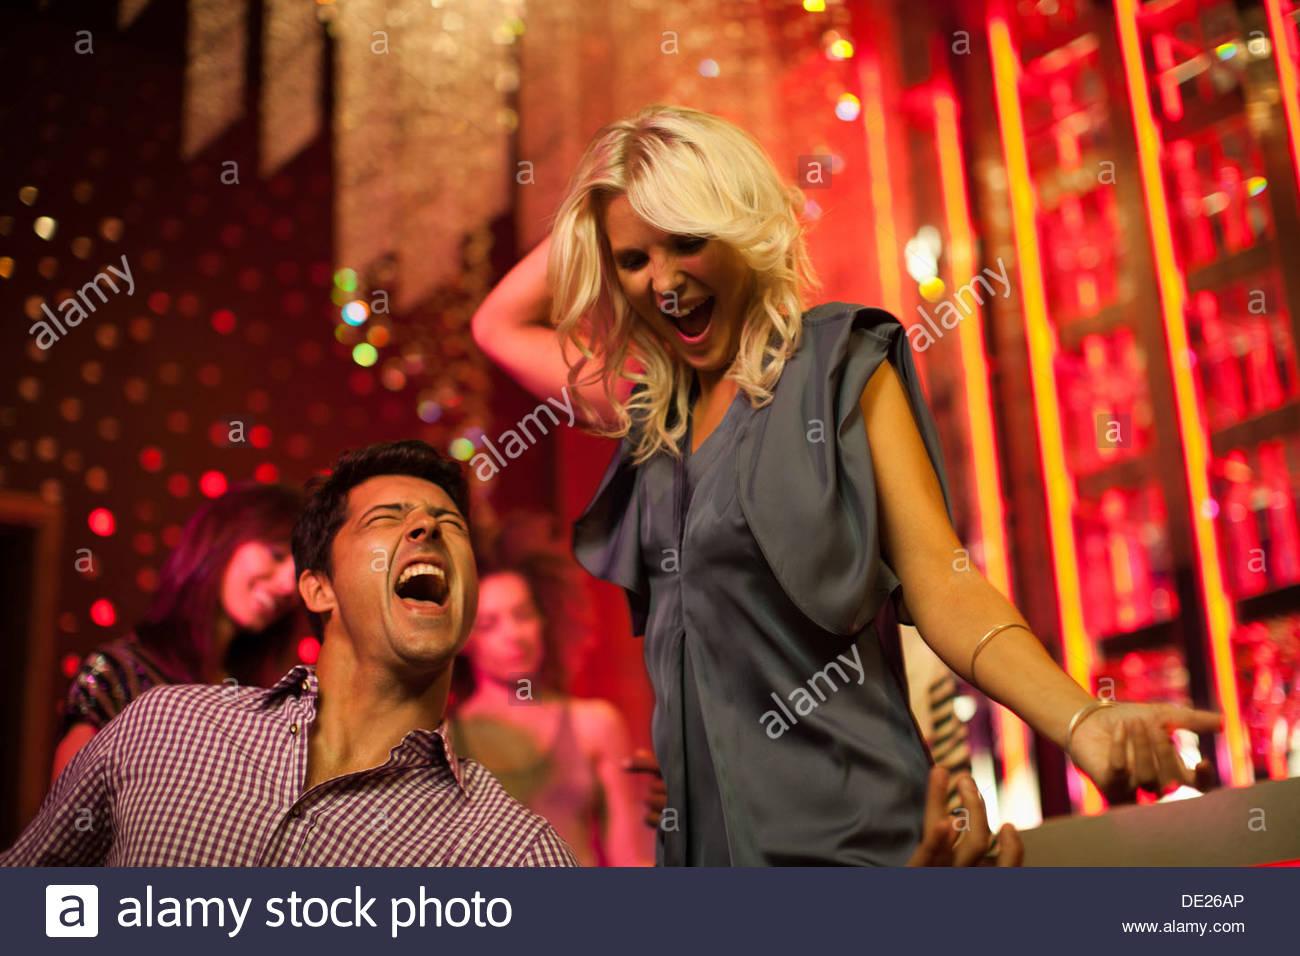 Friends dancing at nightclub - Stock Image